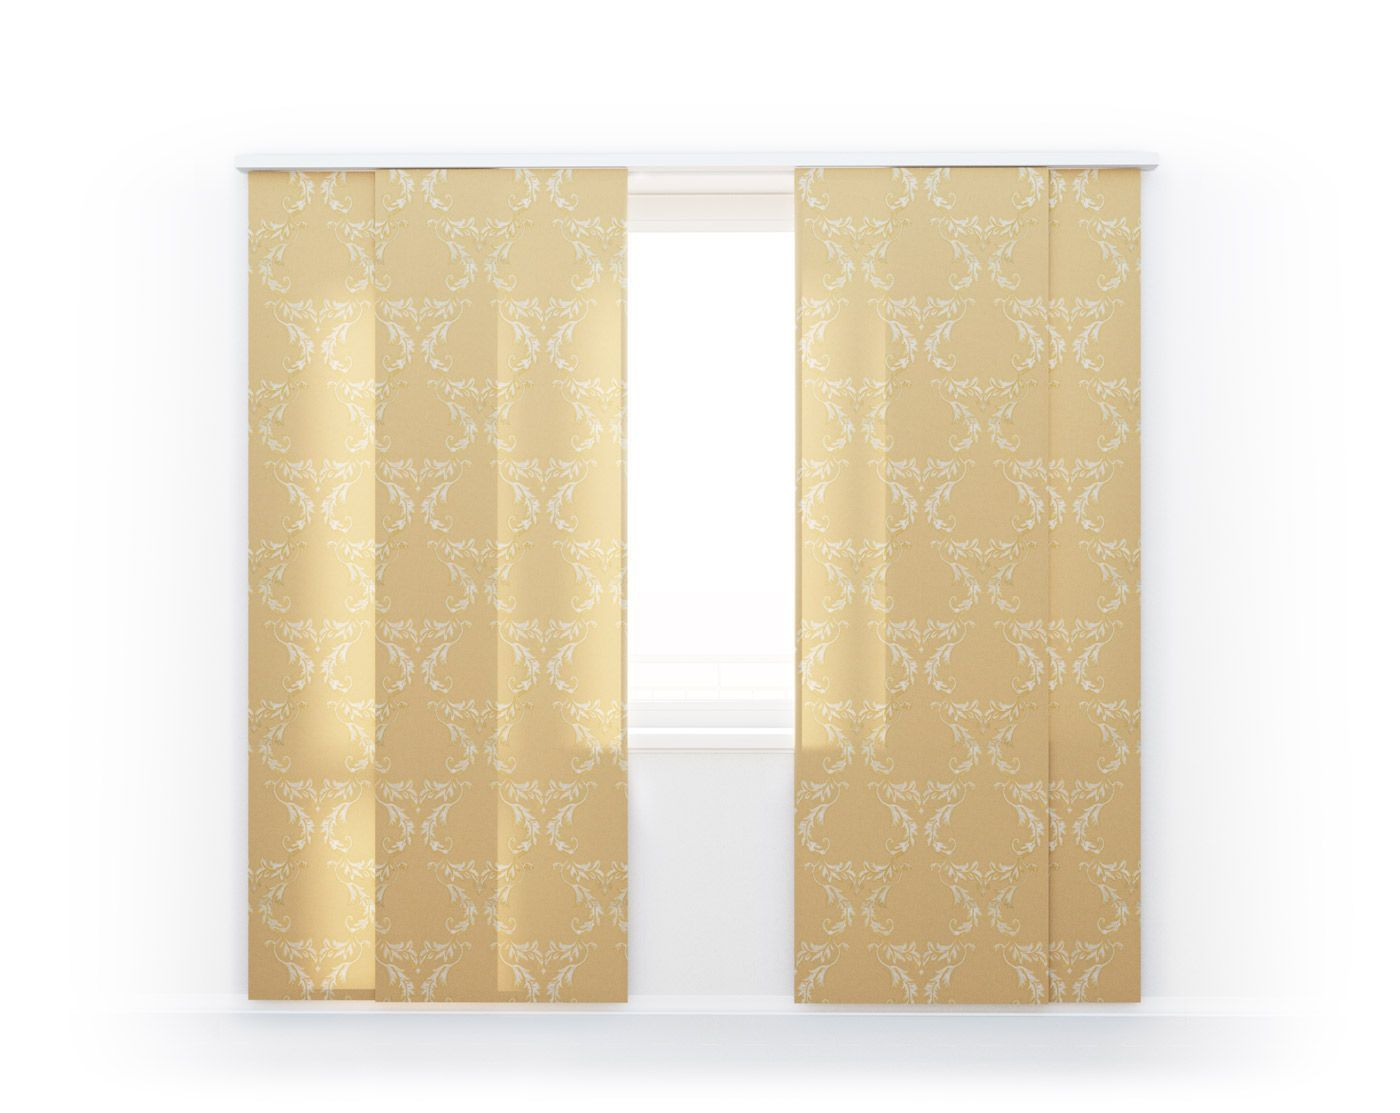 Японские шторы Louis D'or, 2375/22